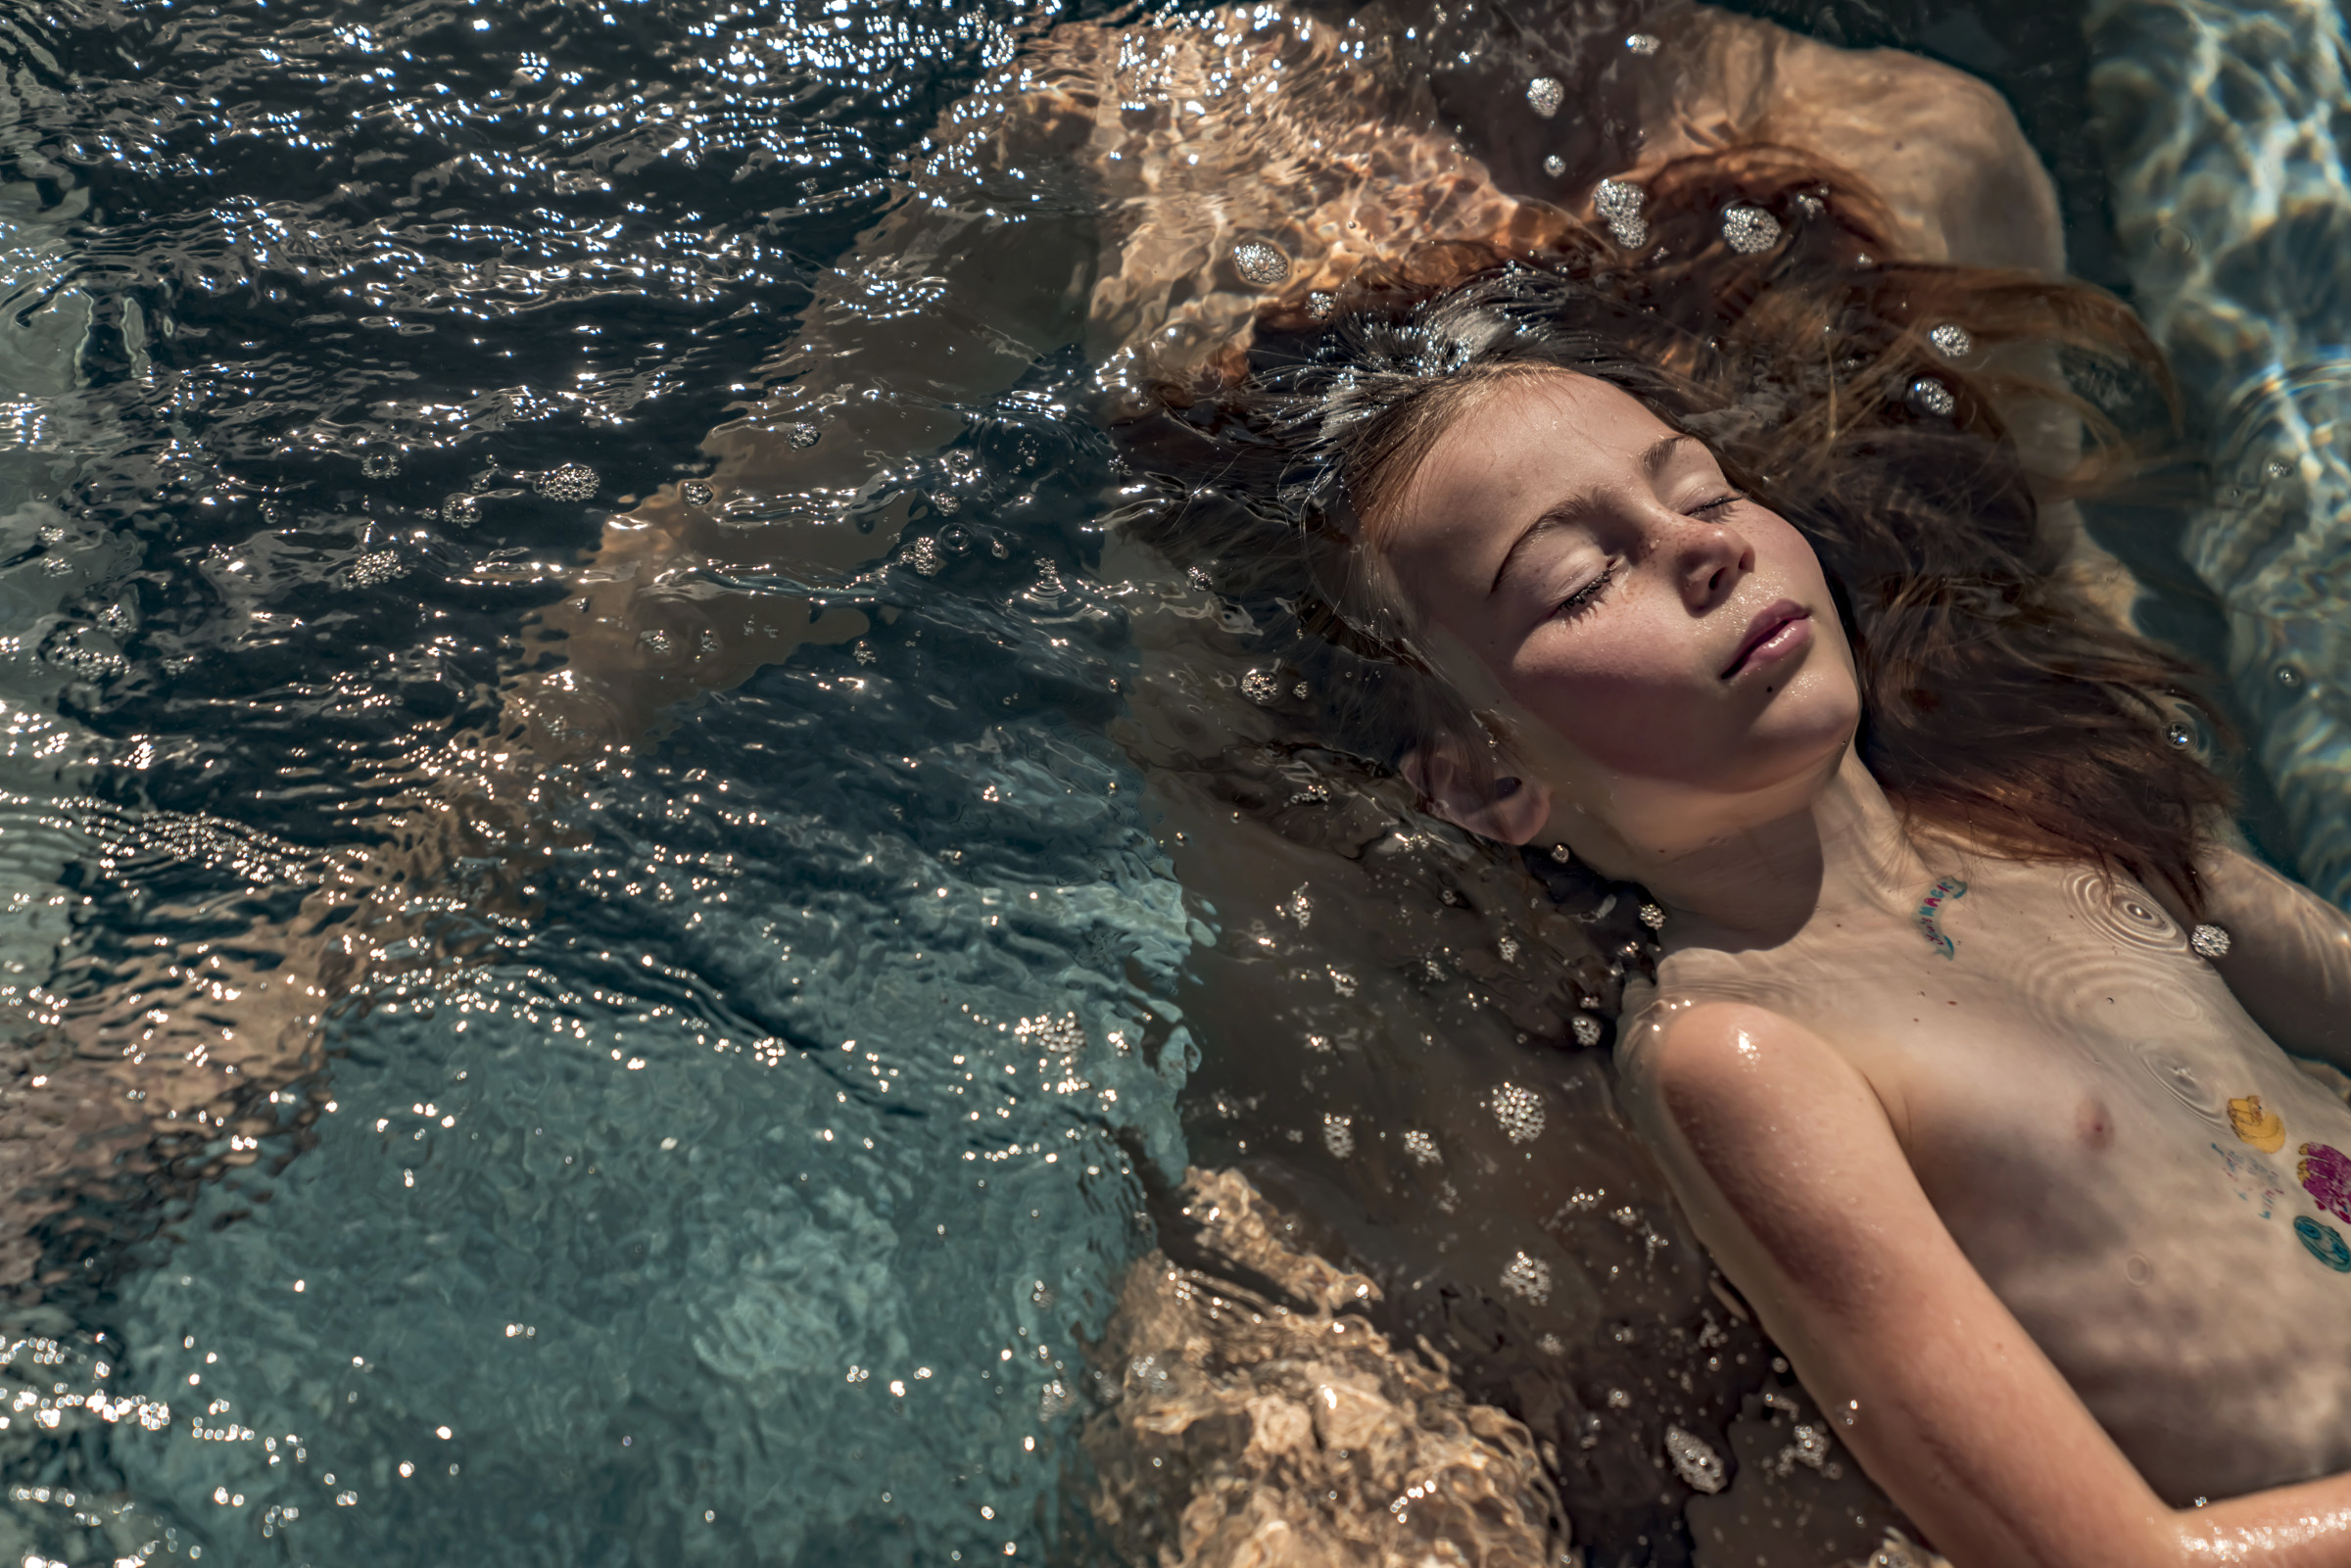 """Heather and Rowan"" from  The Shower Series  shot at Via Maria Villa."